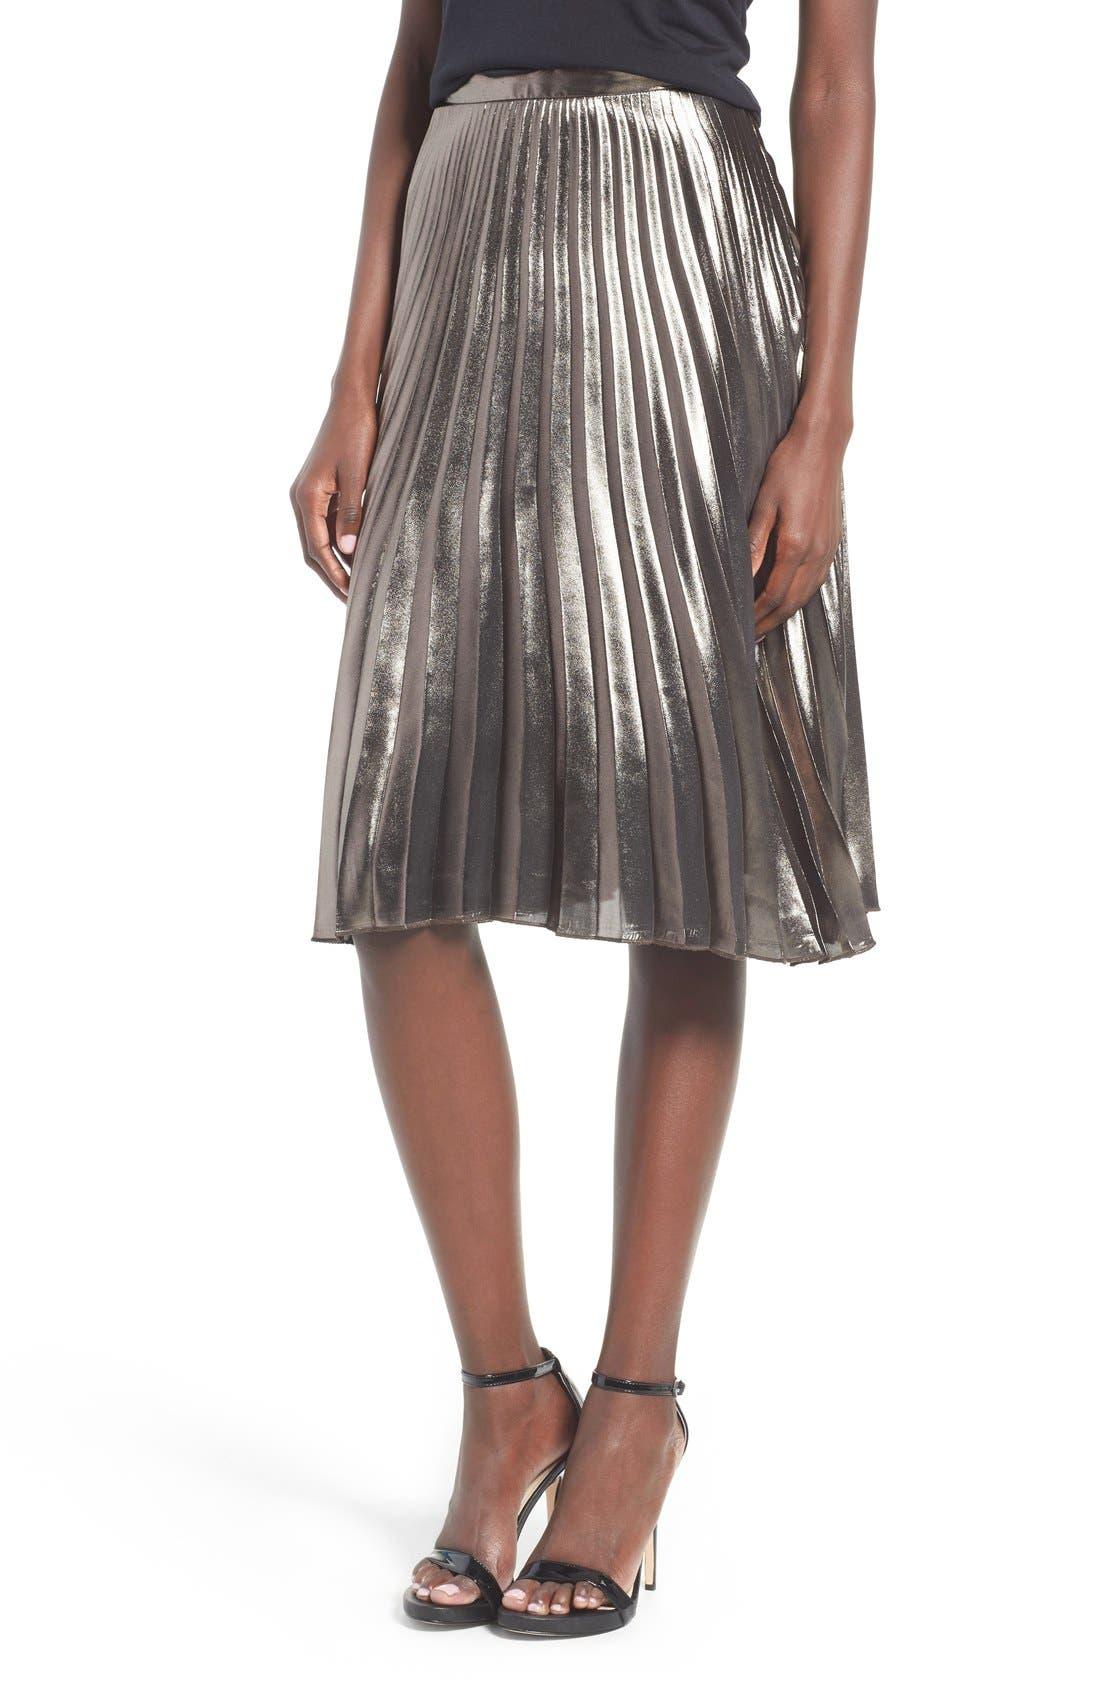 ASTR THE LABEL, ASTR Celeste Pleated Skirt, Main thumbnail 1, color, 224